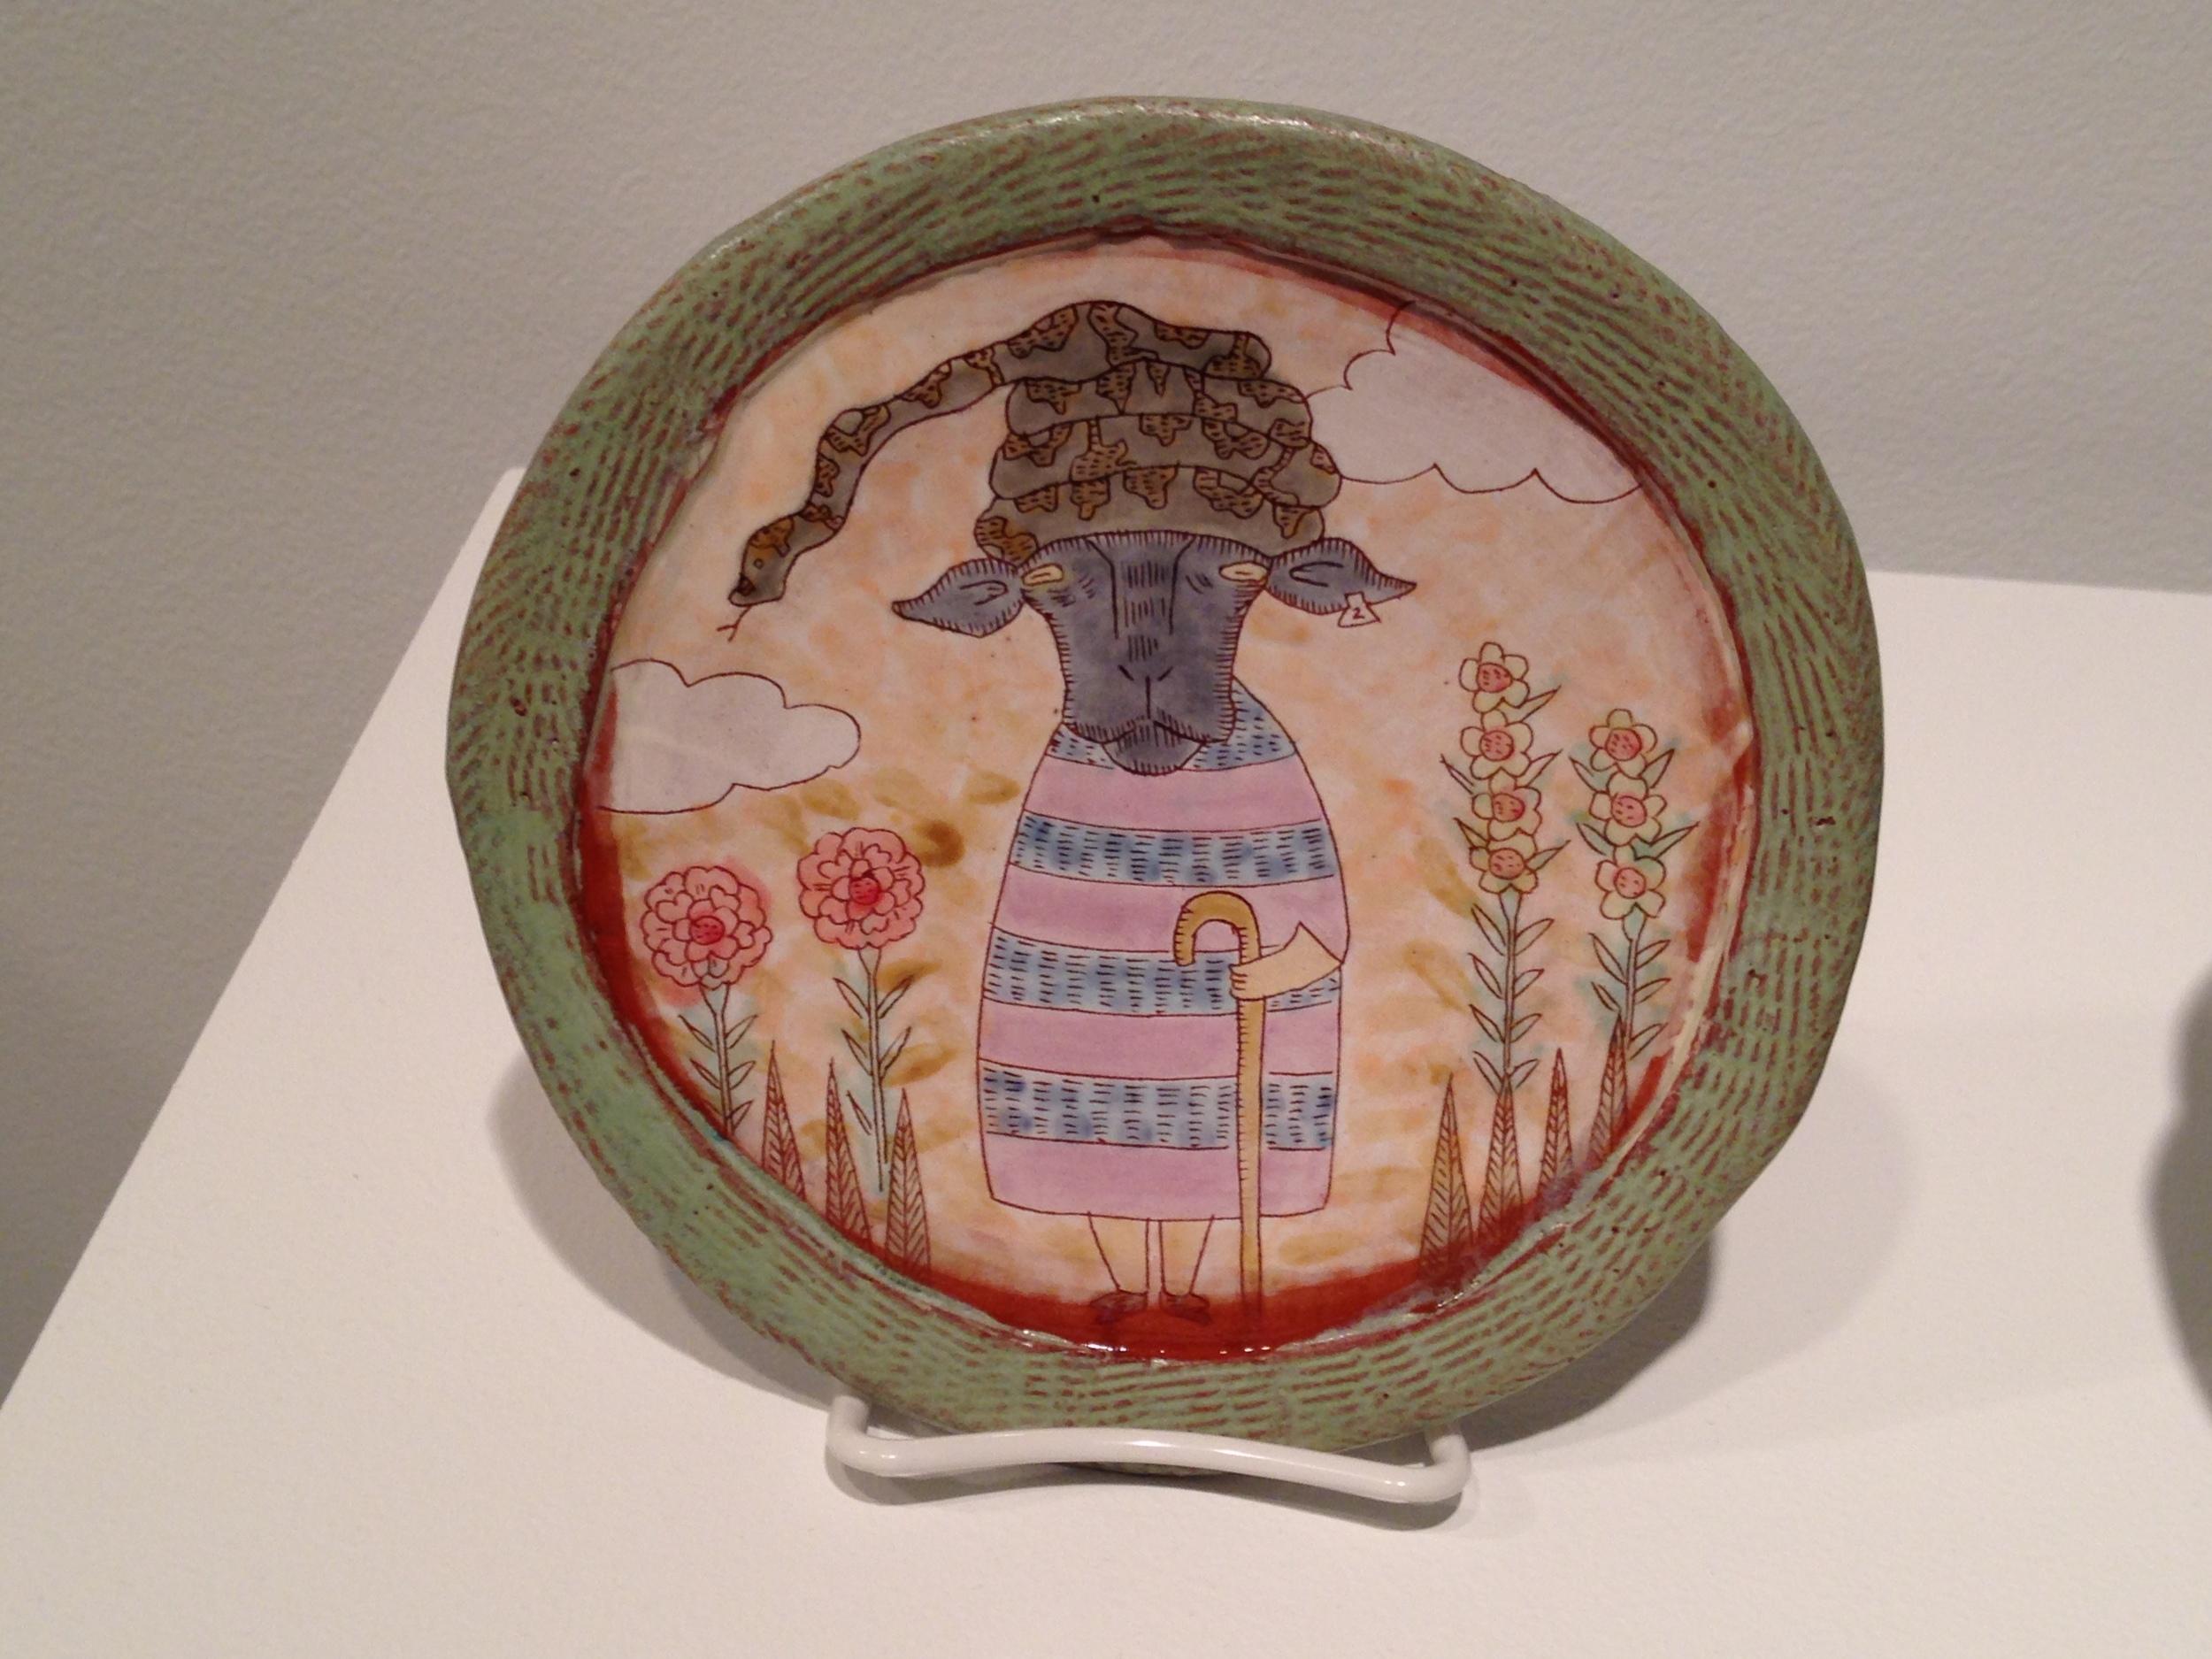 (Shoko Teruyama. Sheep plate, earthenware, slip and glazes, ca. 2014-2015)